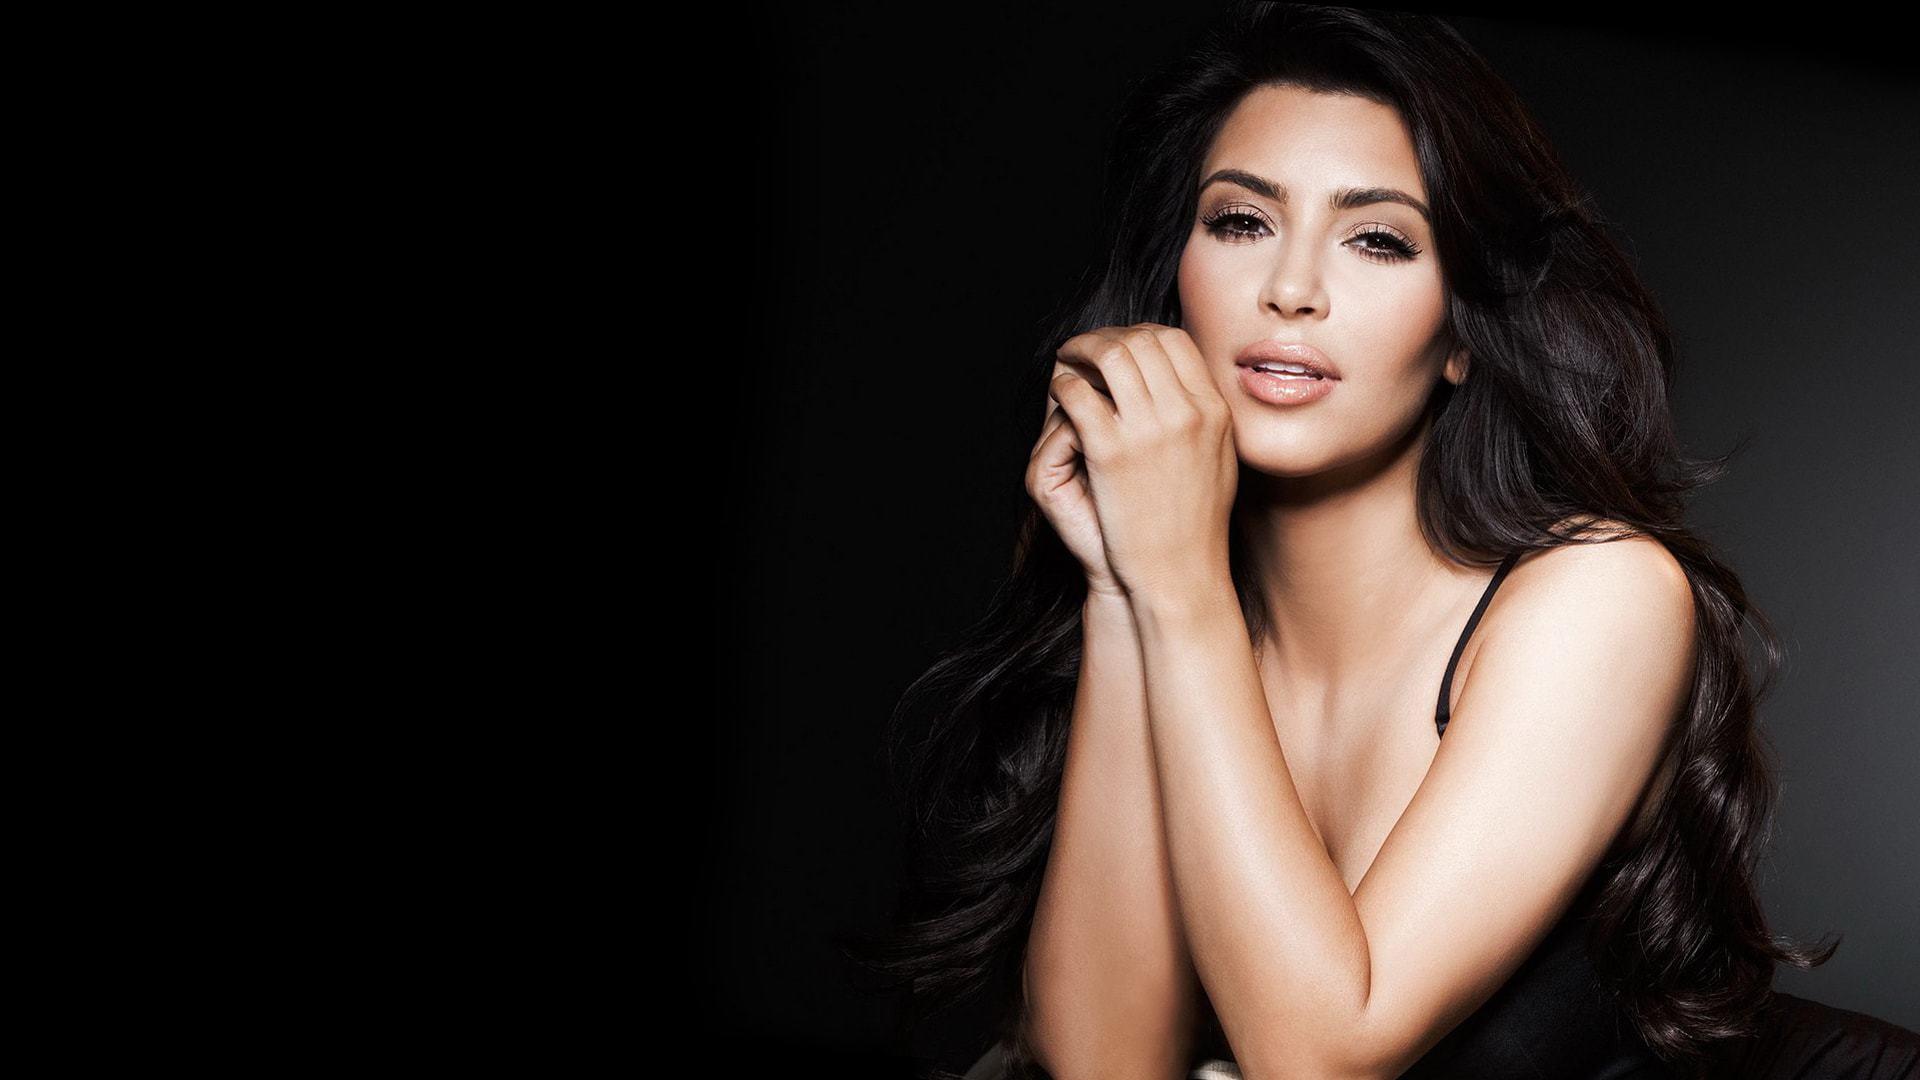 Kim Kardashian High Definition Wallpapers